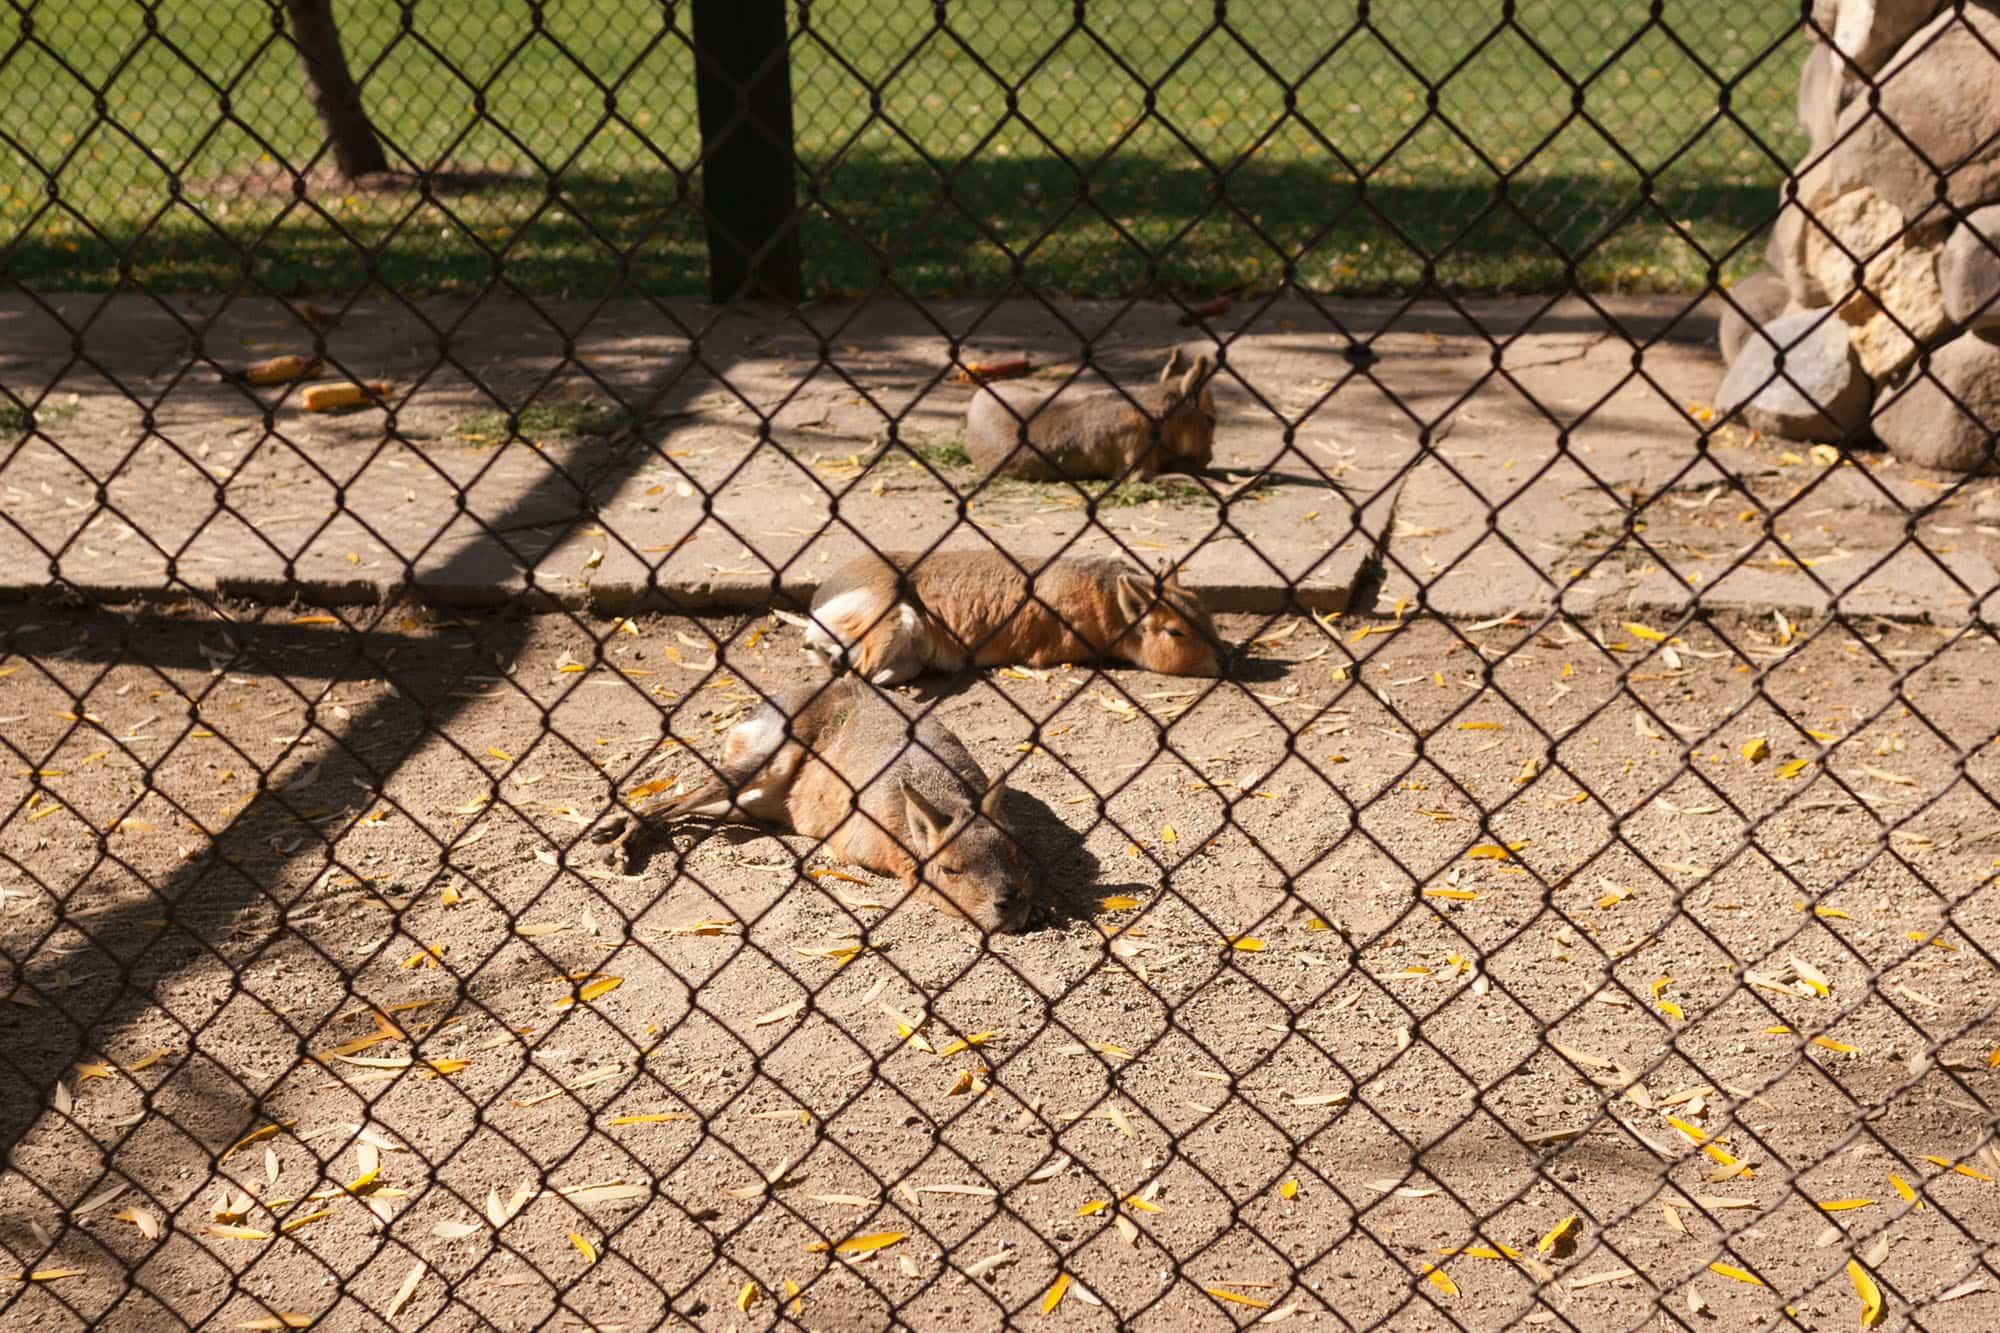 Jackalope at Bear Den Zoo and Petting Farm in Wisconsin